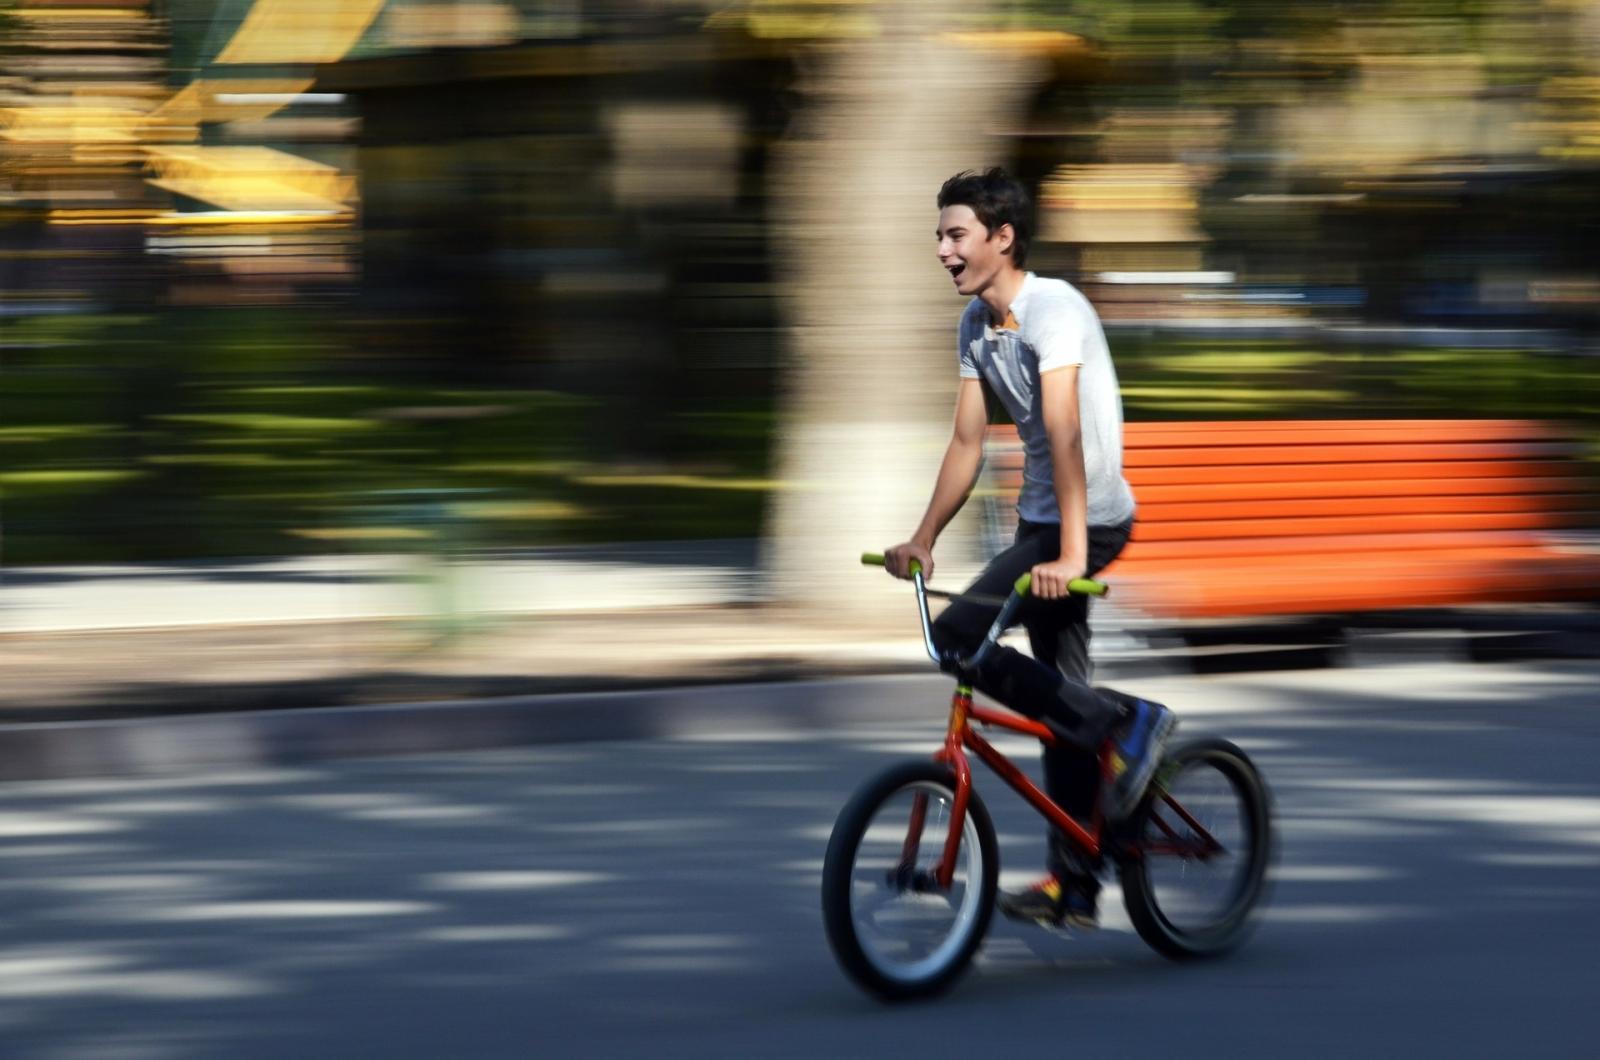 Reglas del ciclismo: Usa casco